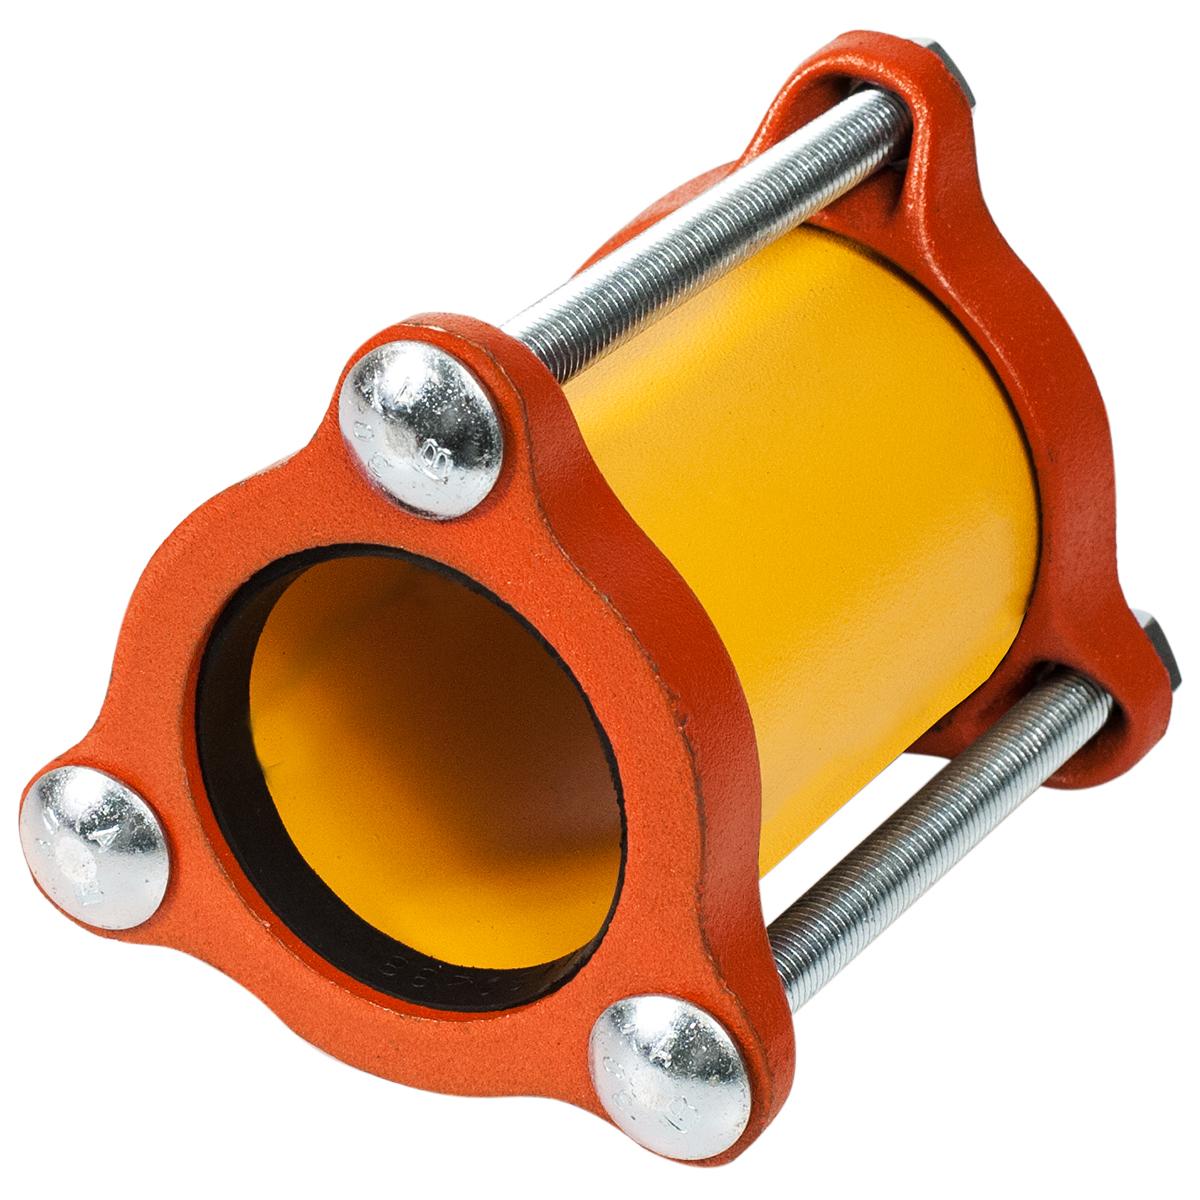 511 - Ductile iron coupling